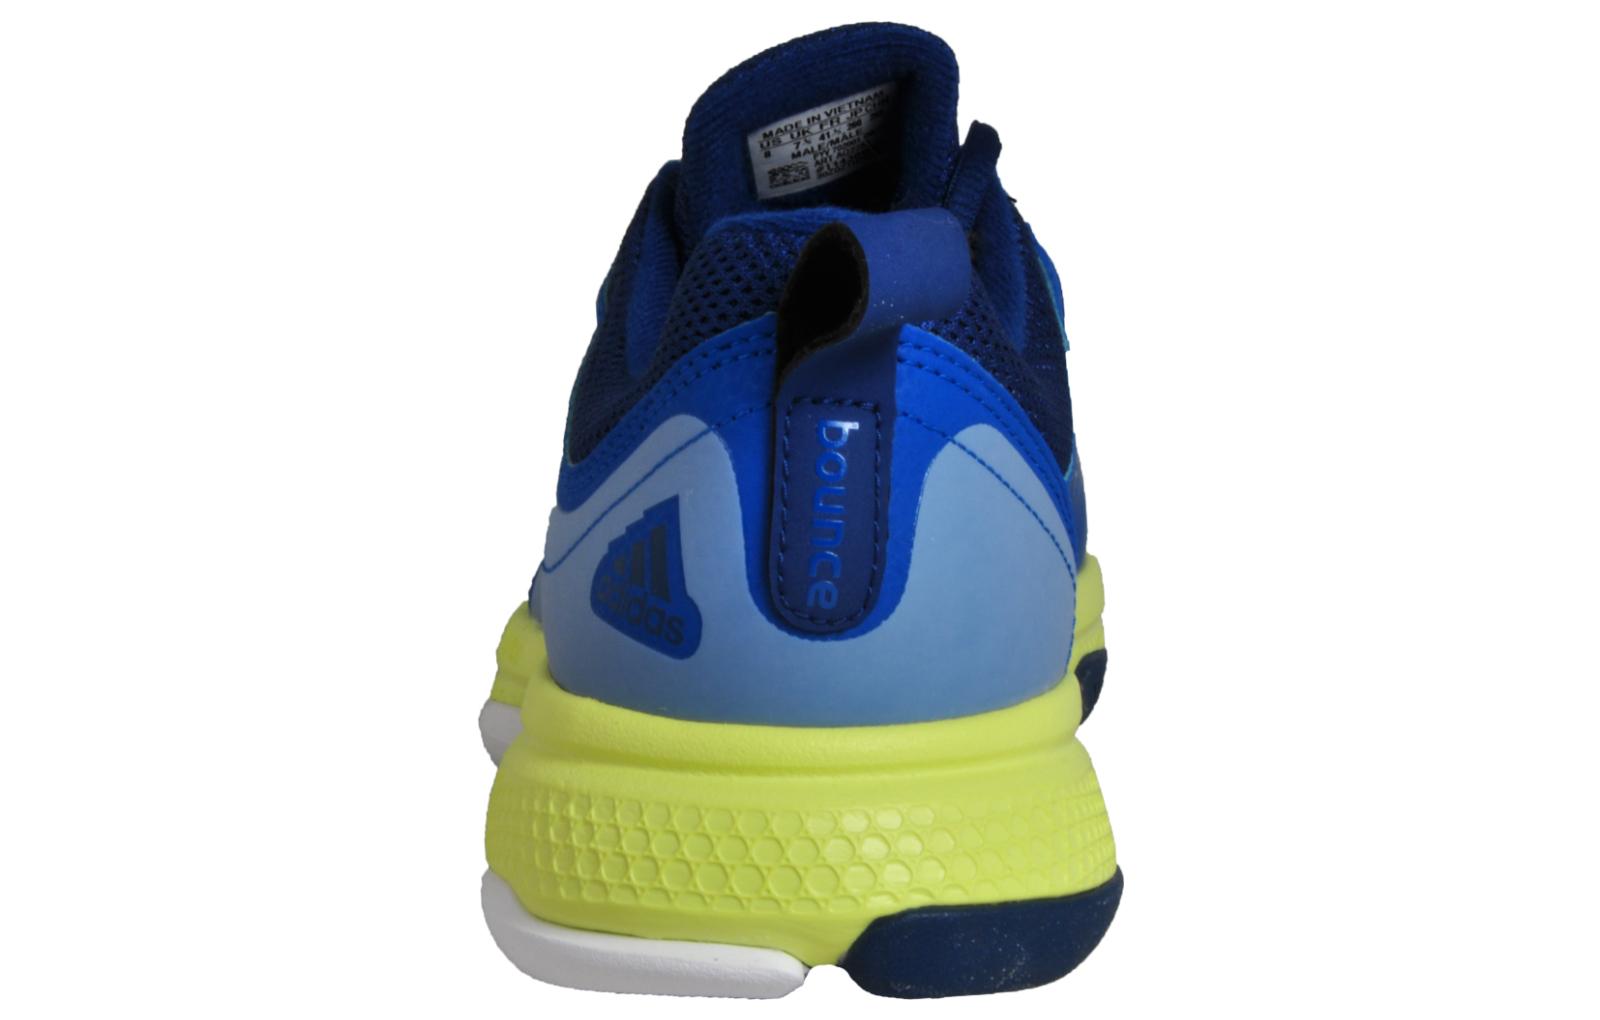 39bb4f611255b Adidas Barricade Classic Bounce Men s Tennis Court Fitness Trainers Blue